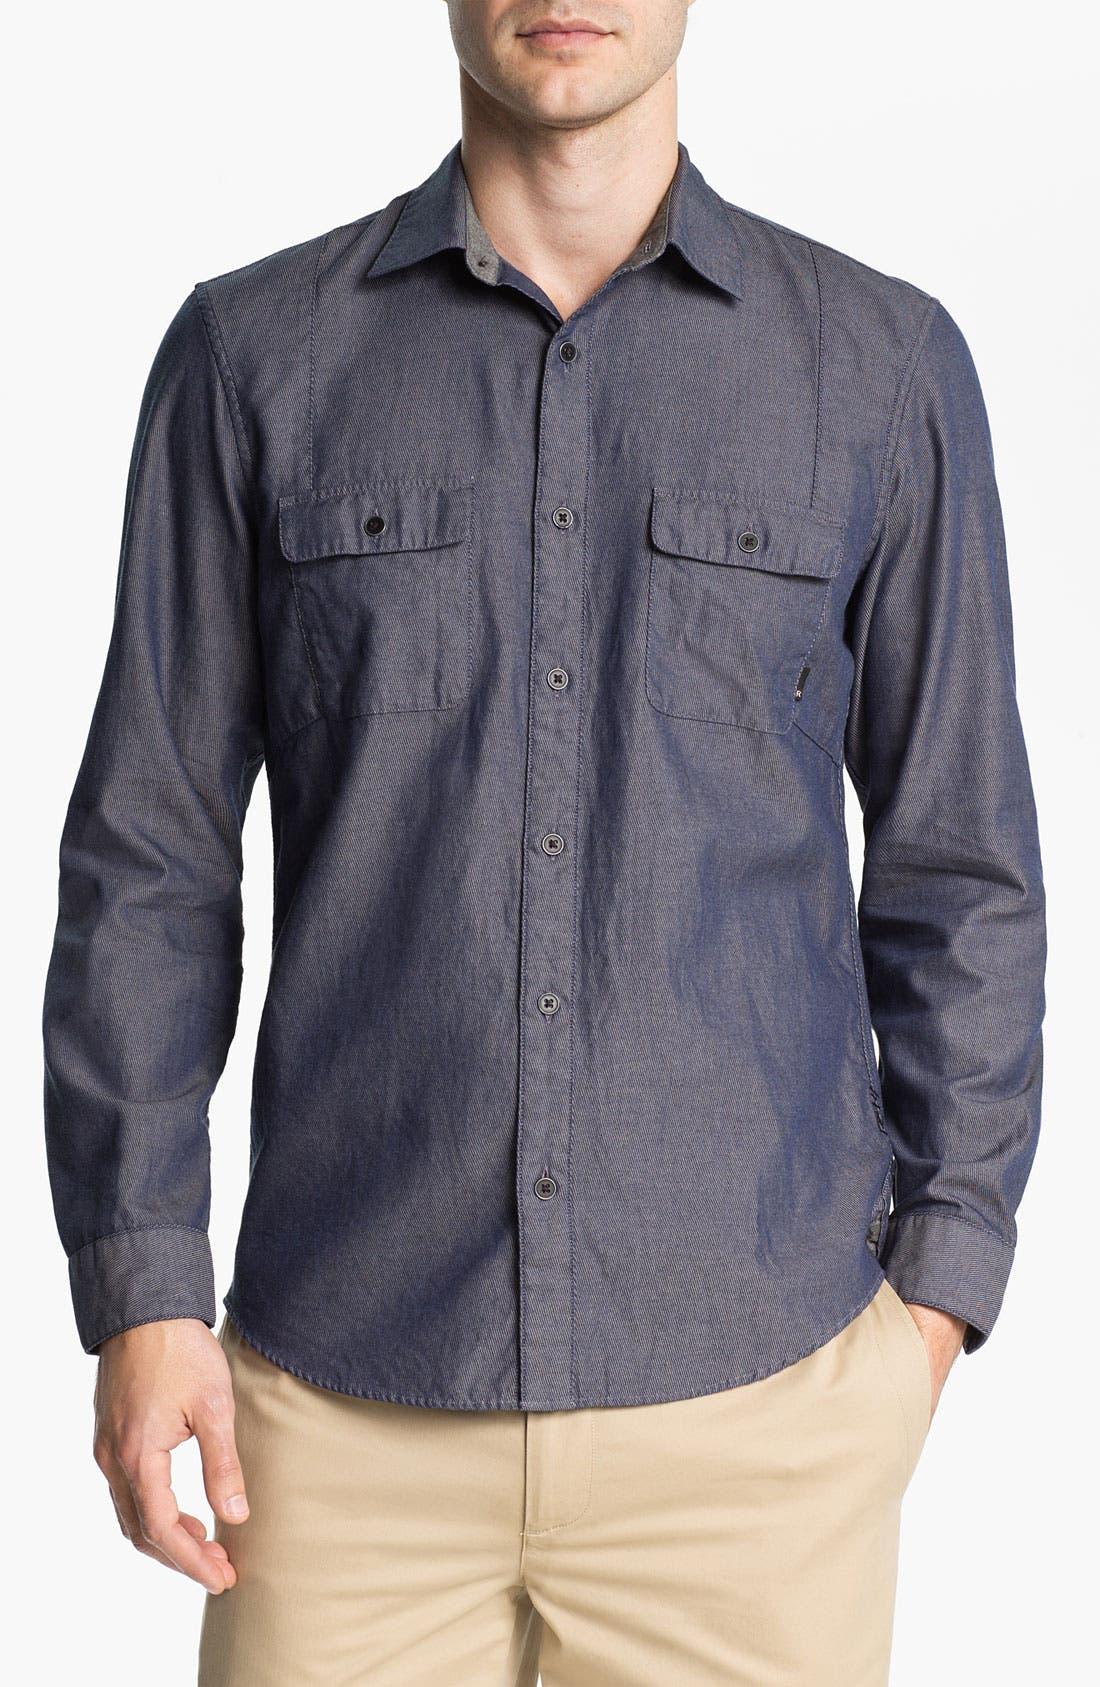 Main Image - R44 Rogan Standard Issue Twill Denim Shirt